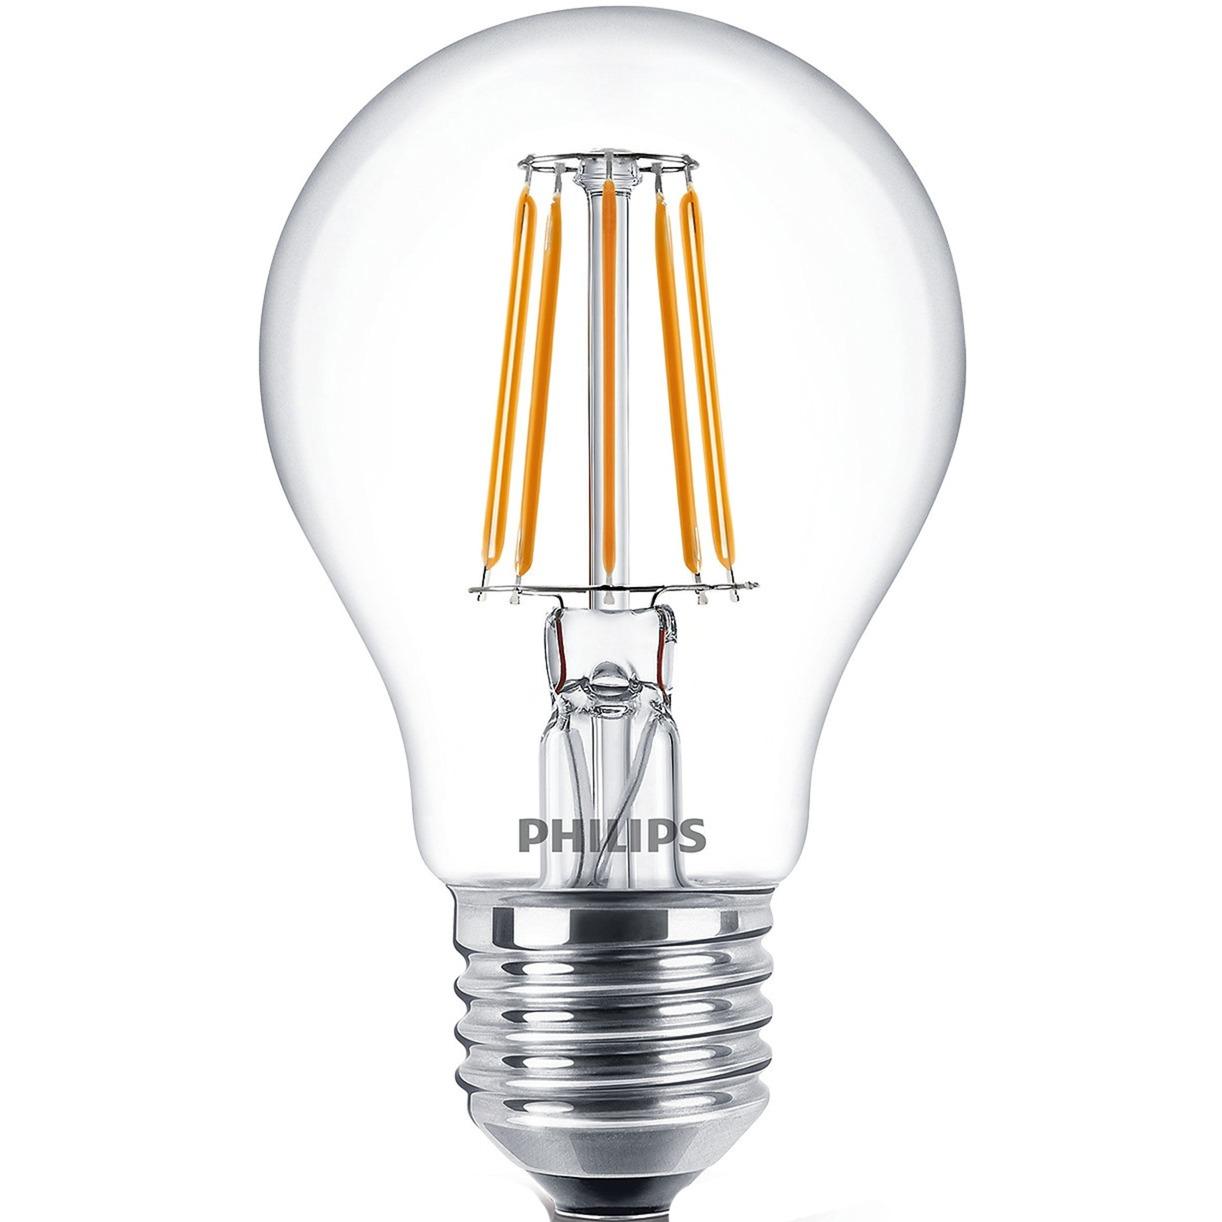 60220 Chaud Kwh Energy Classic Àblanc Ampoule 8718696742730 E27 Led Saving 2407 7w LampLampe ChaudTransparentA50 ABlanc FK1uTlcJ3